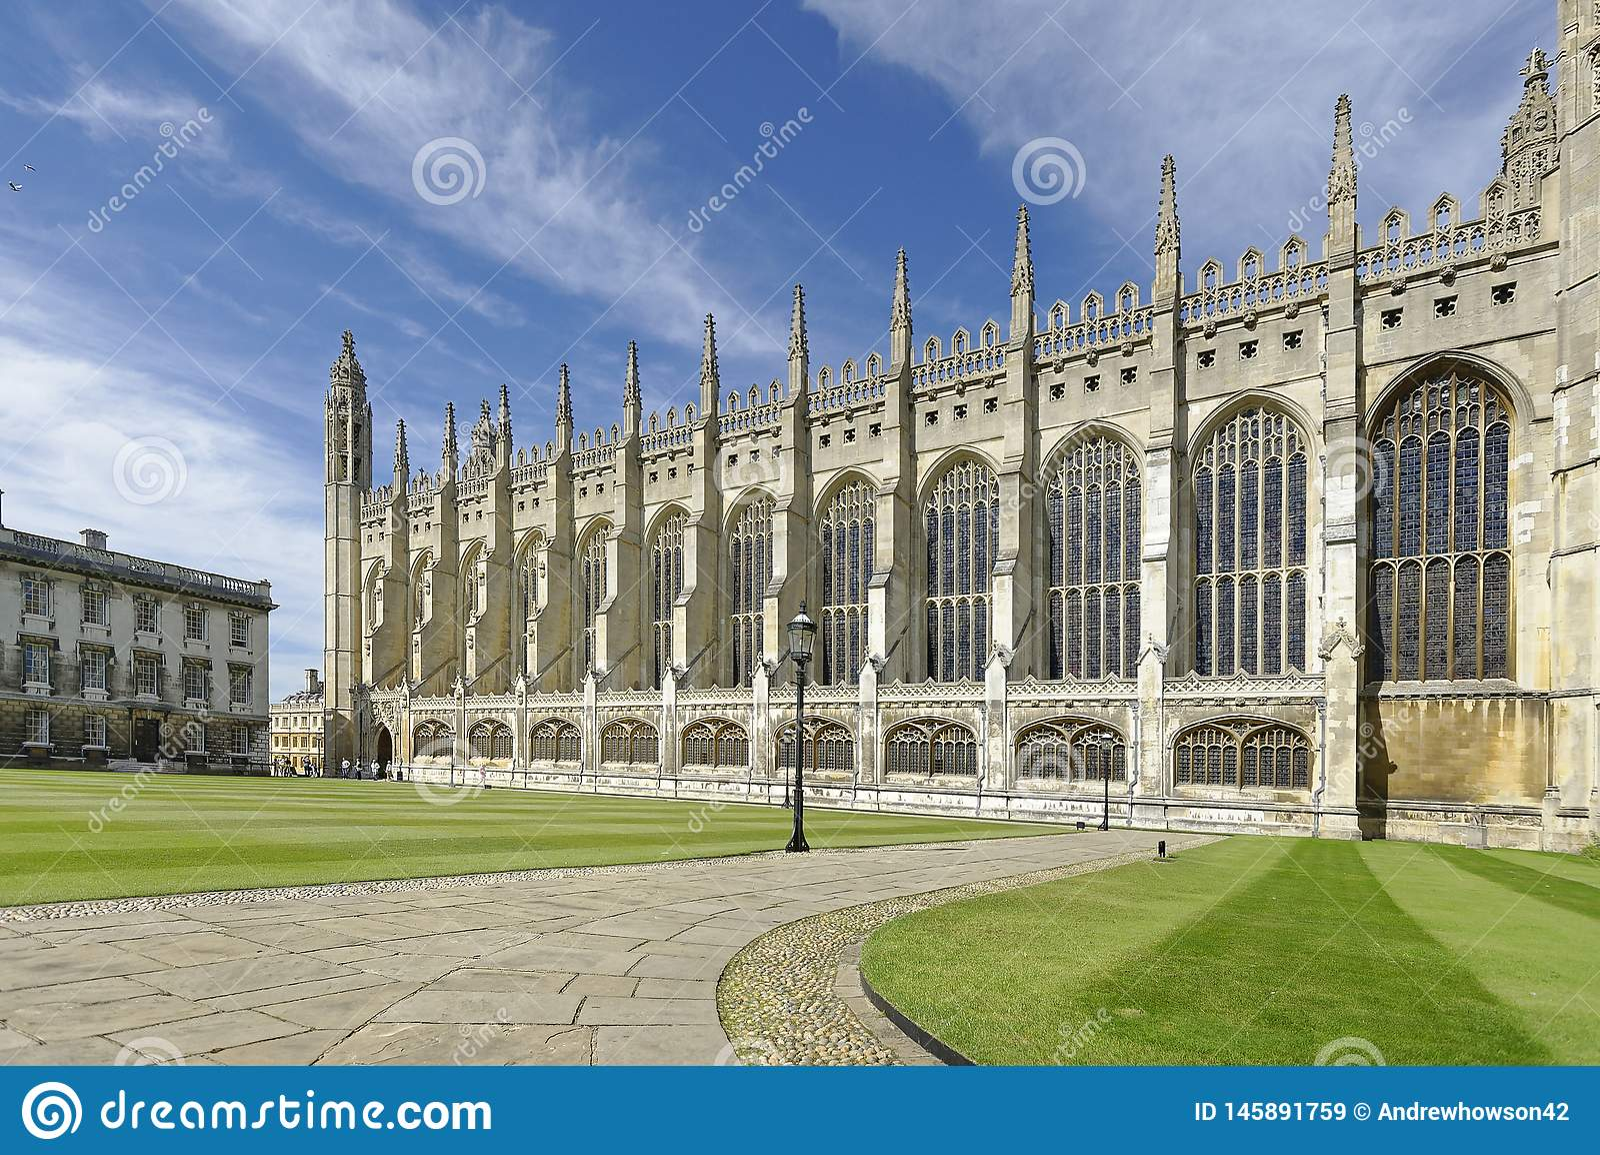 Часовня Кембридж королей Коллежа внешний набор против неба лета голубого